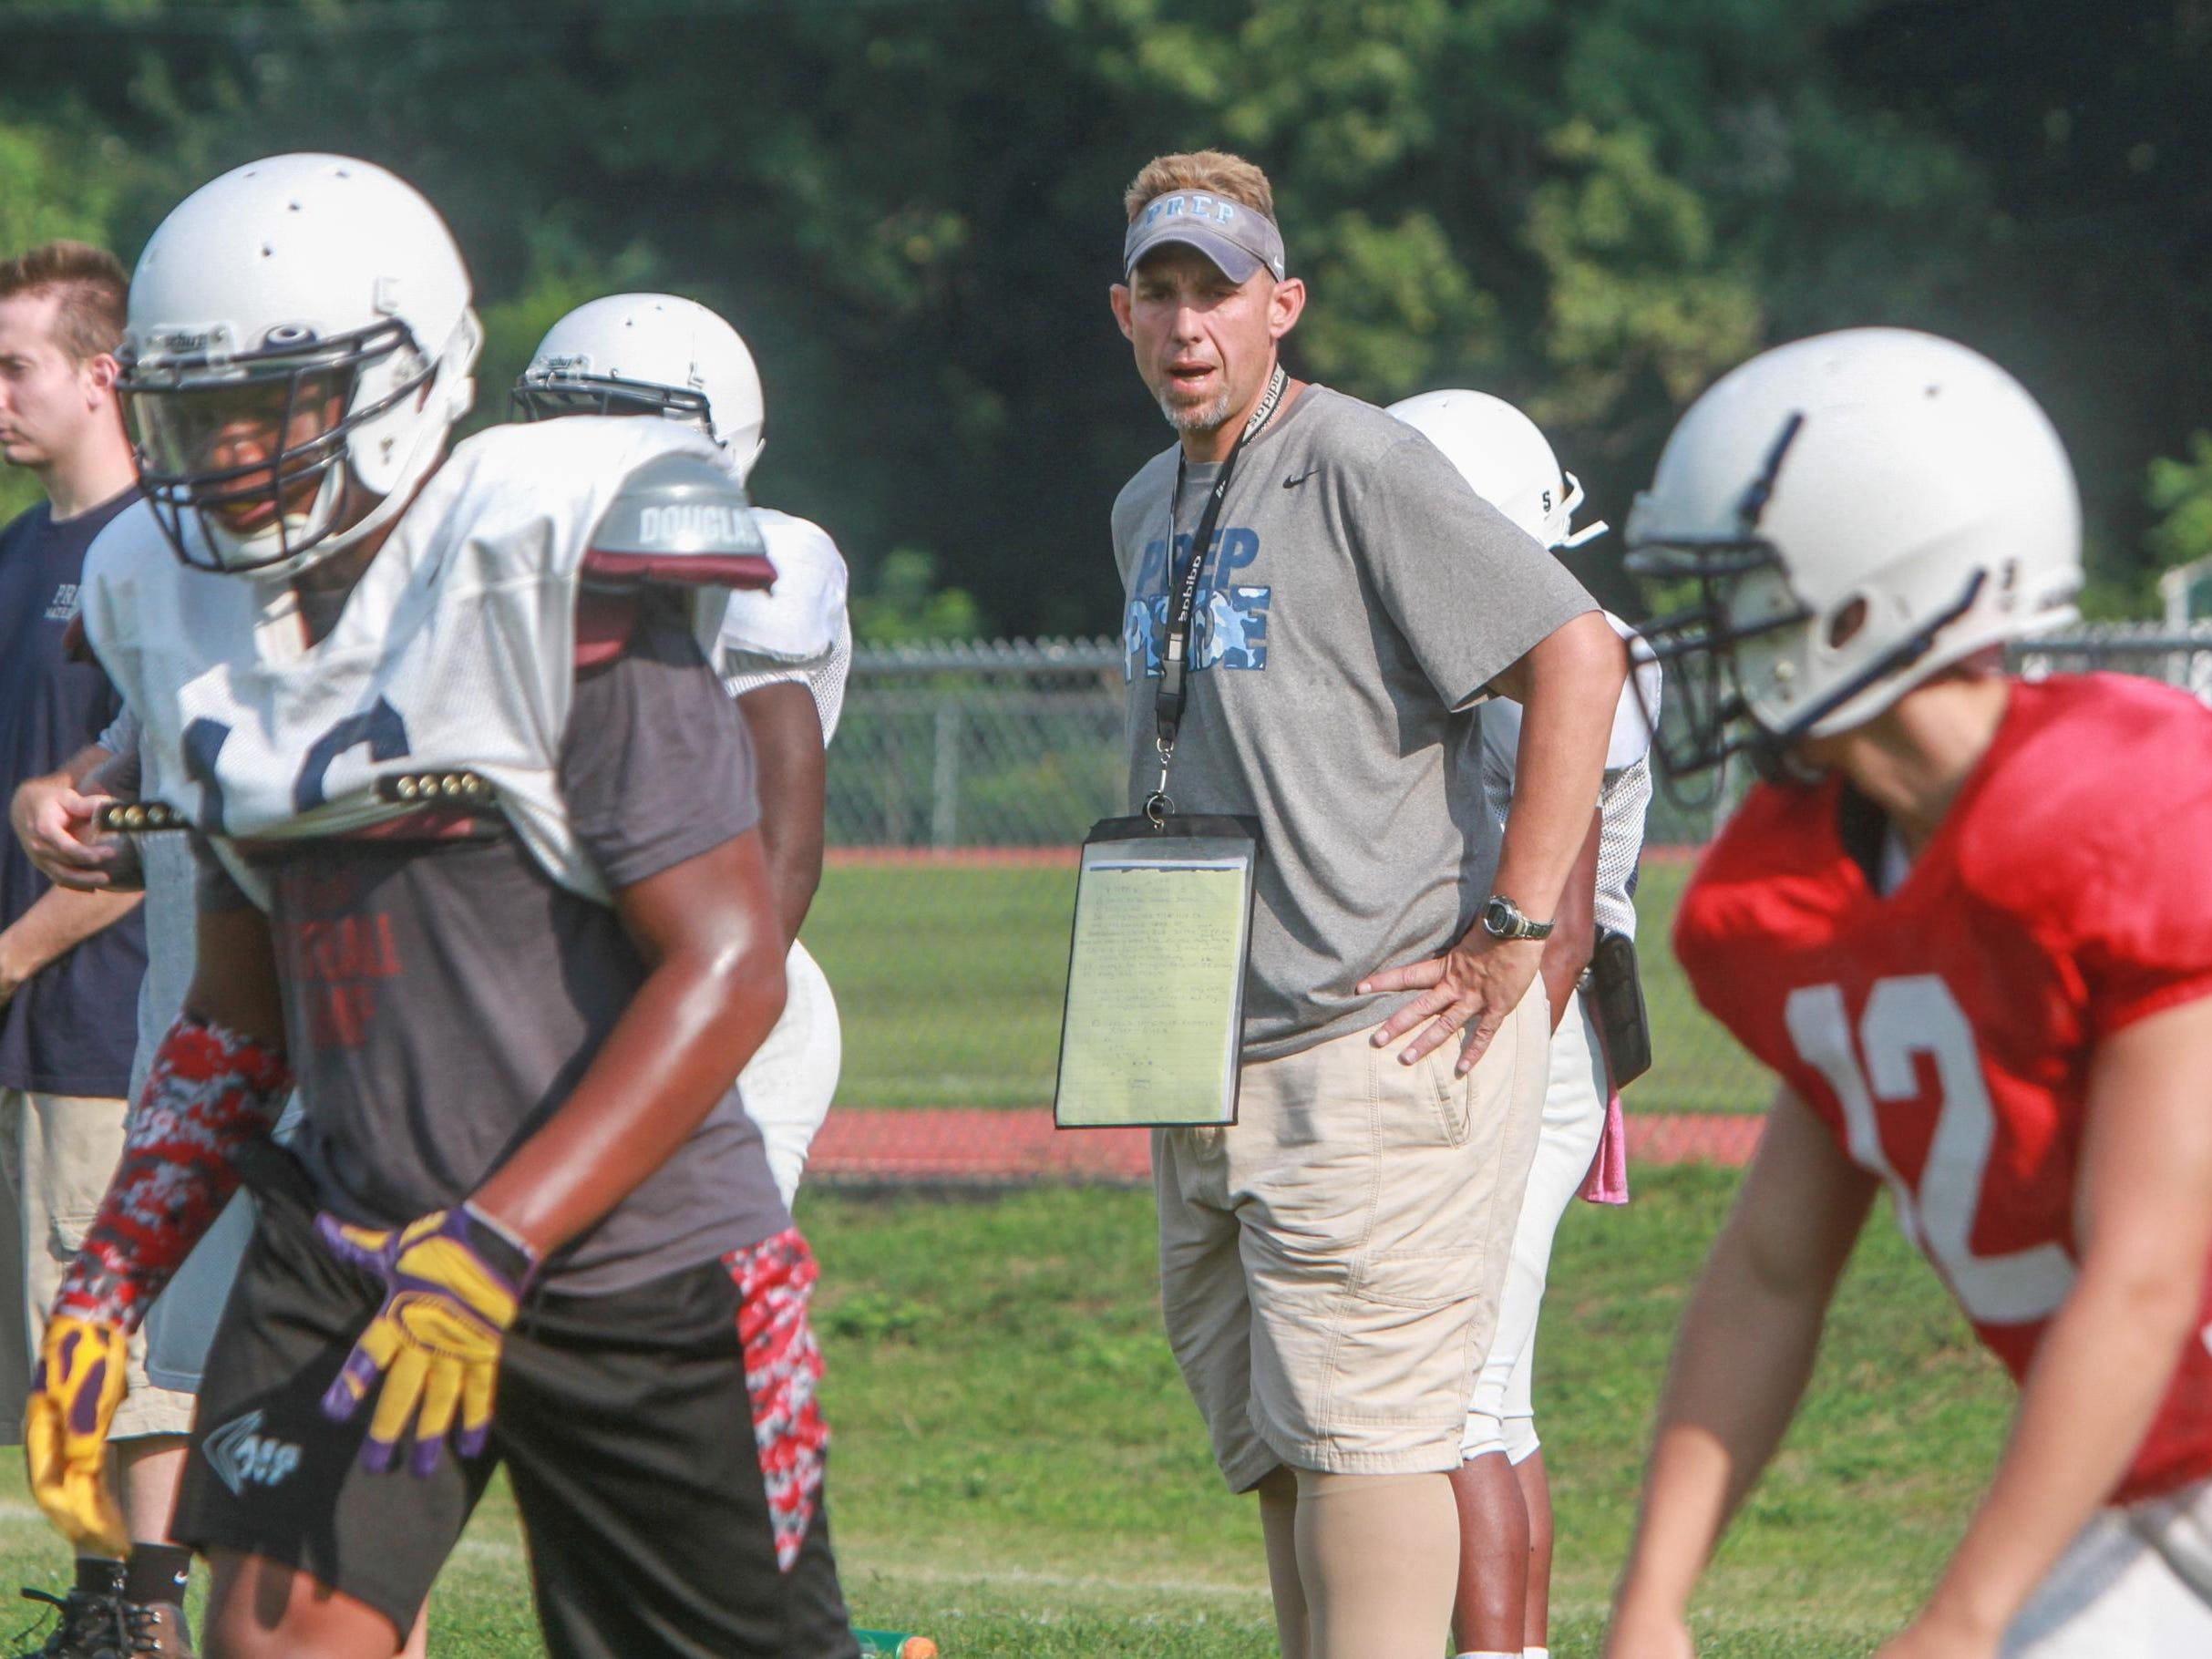 Mater Dei practices Aug. 25 under first-year head coach Shannon Hoadley.